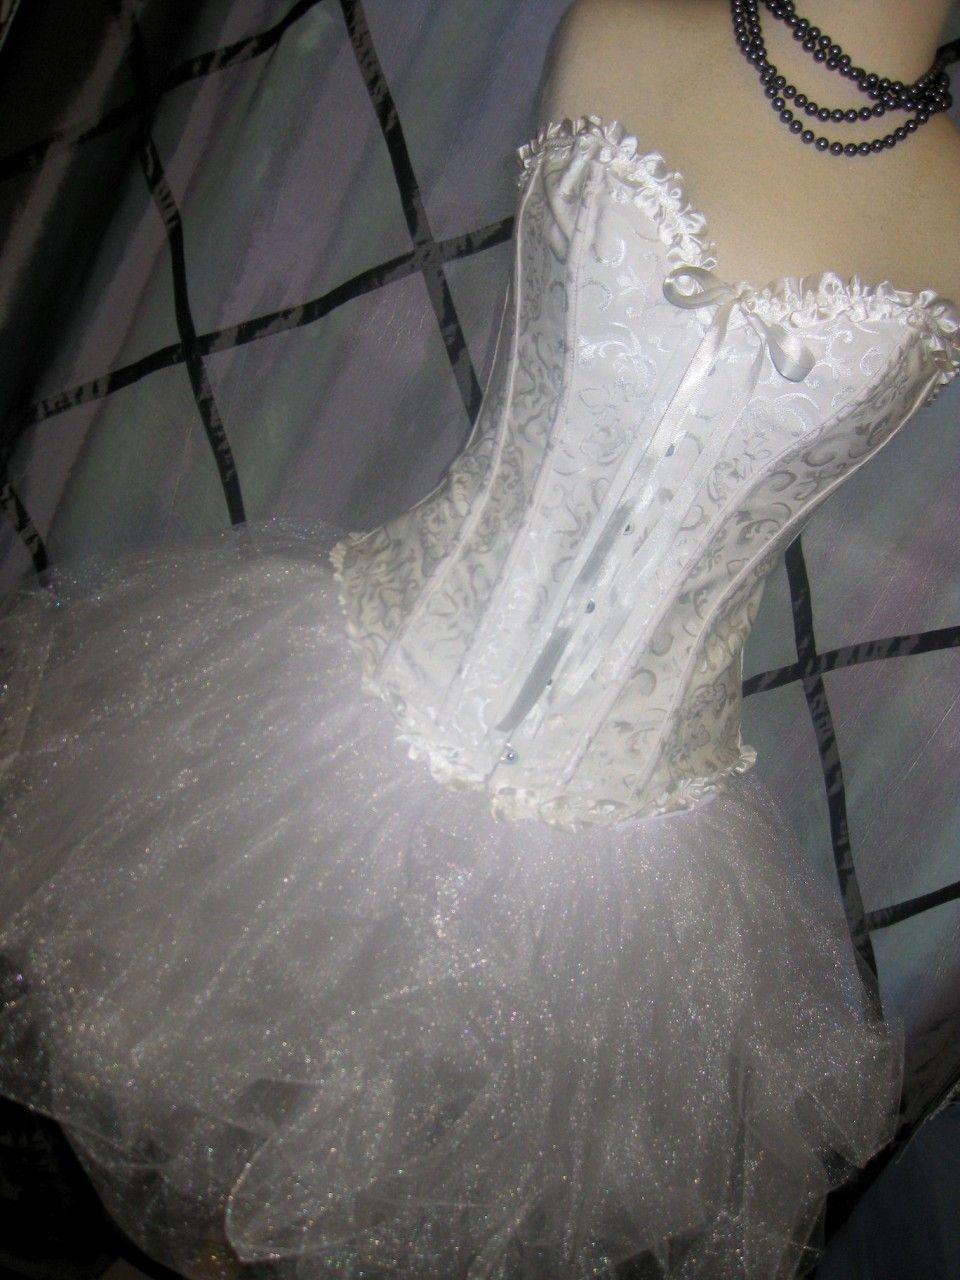 Elite wedding dresses  Dznr LLC  Elite Bachelorette Party Dress Madonna Like a Virgin